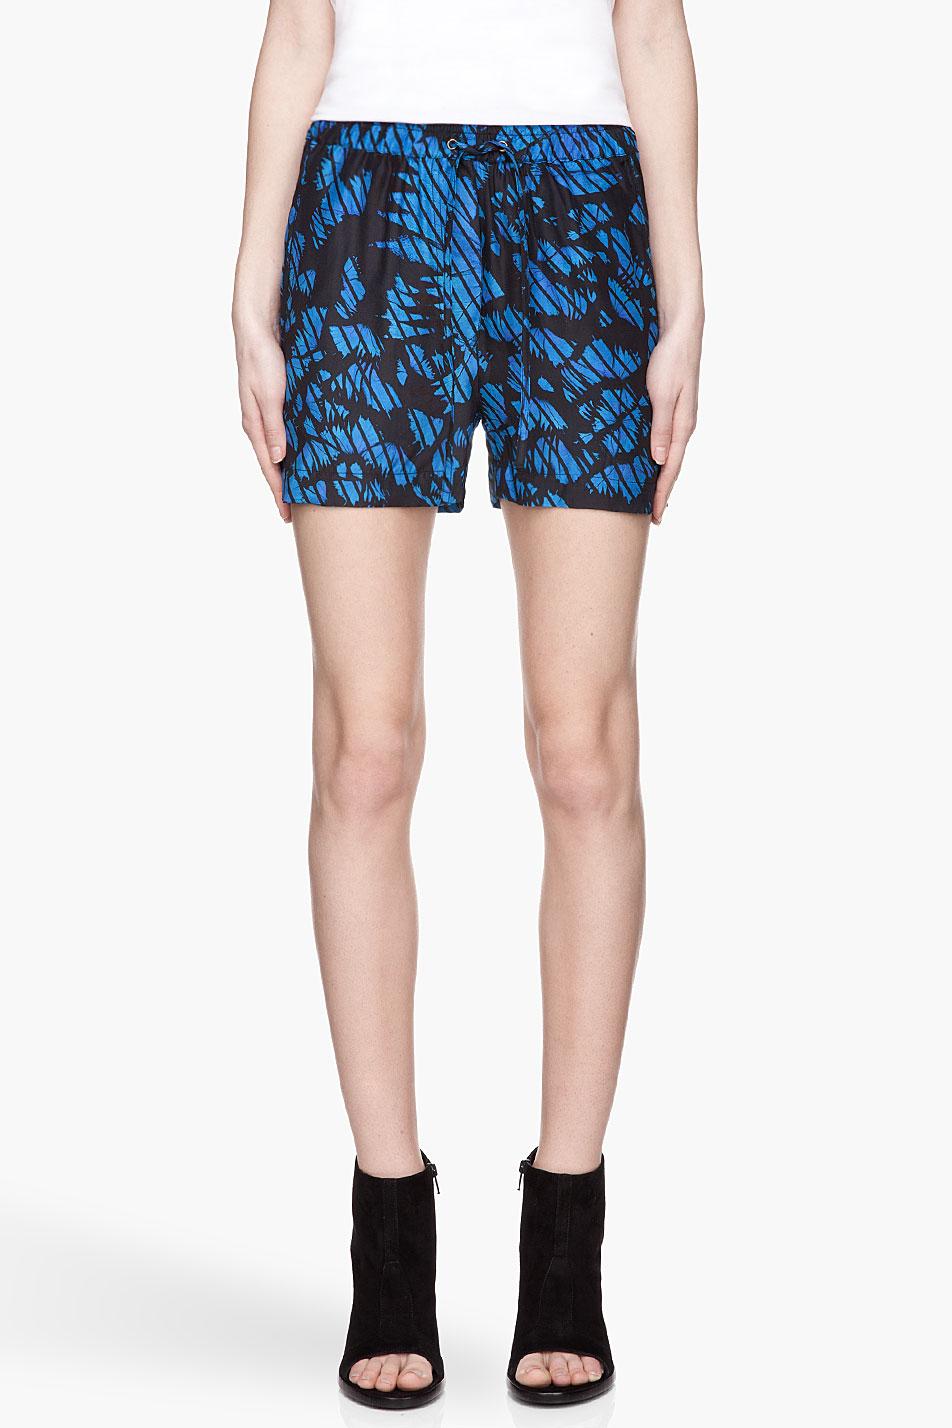 surface to air indigo blue leaves print cross silk shorts